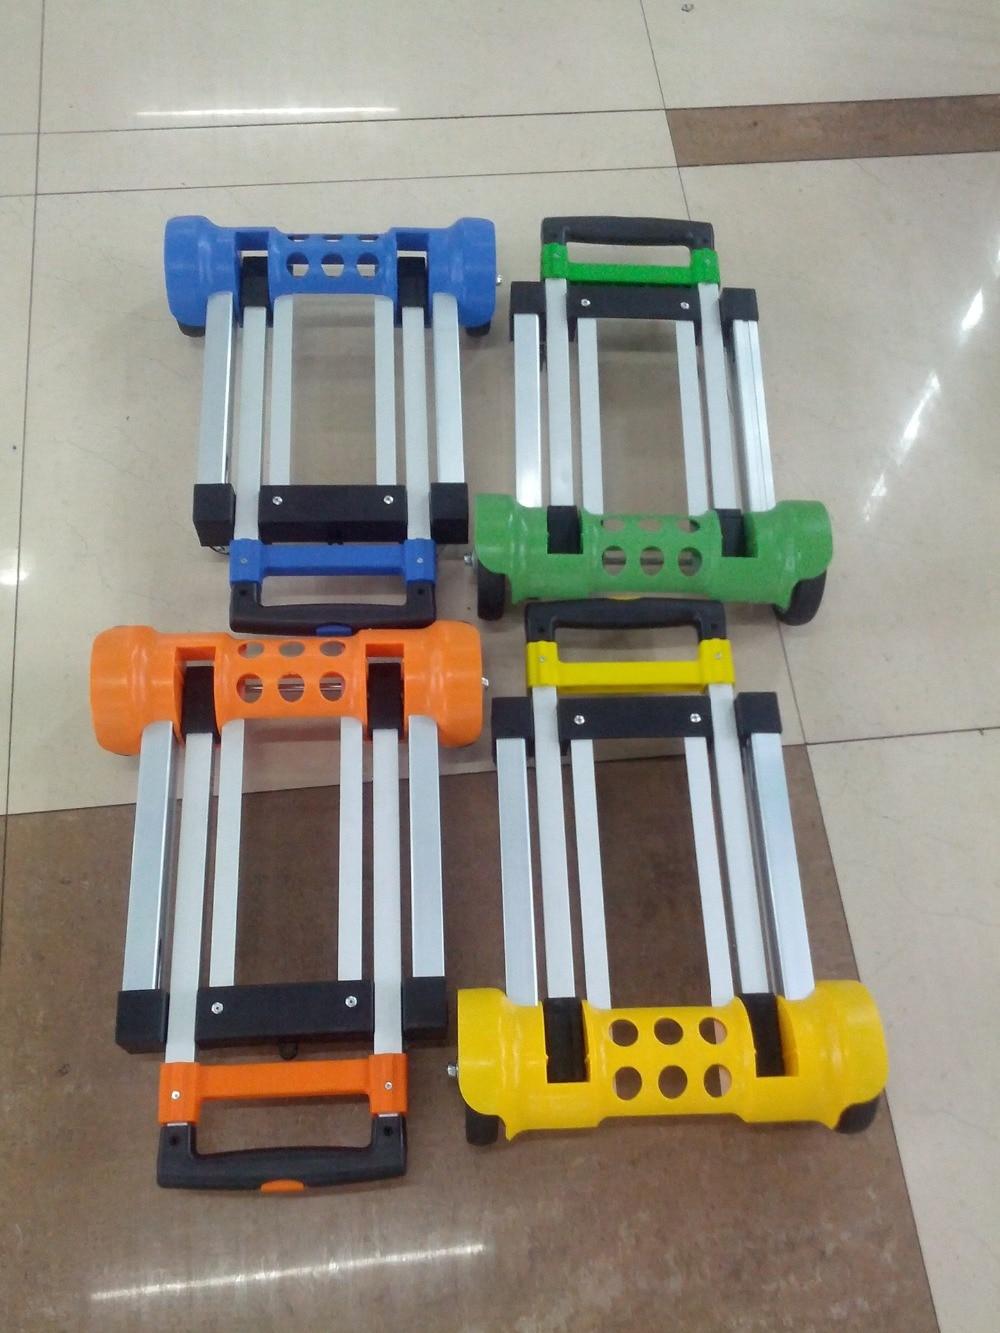 Light folding carts aluminum alloy handle carts Folding Portable hand trolley Luggage Trailer Supermarket Shopping Trolley